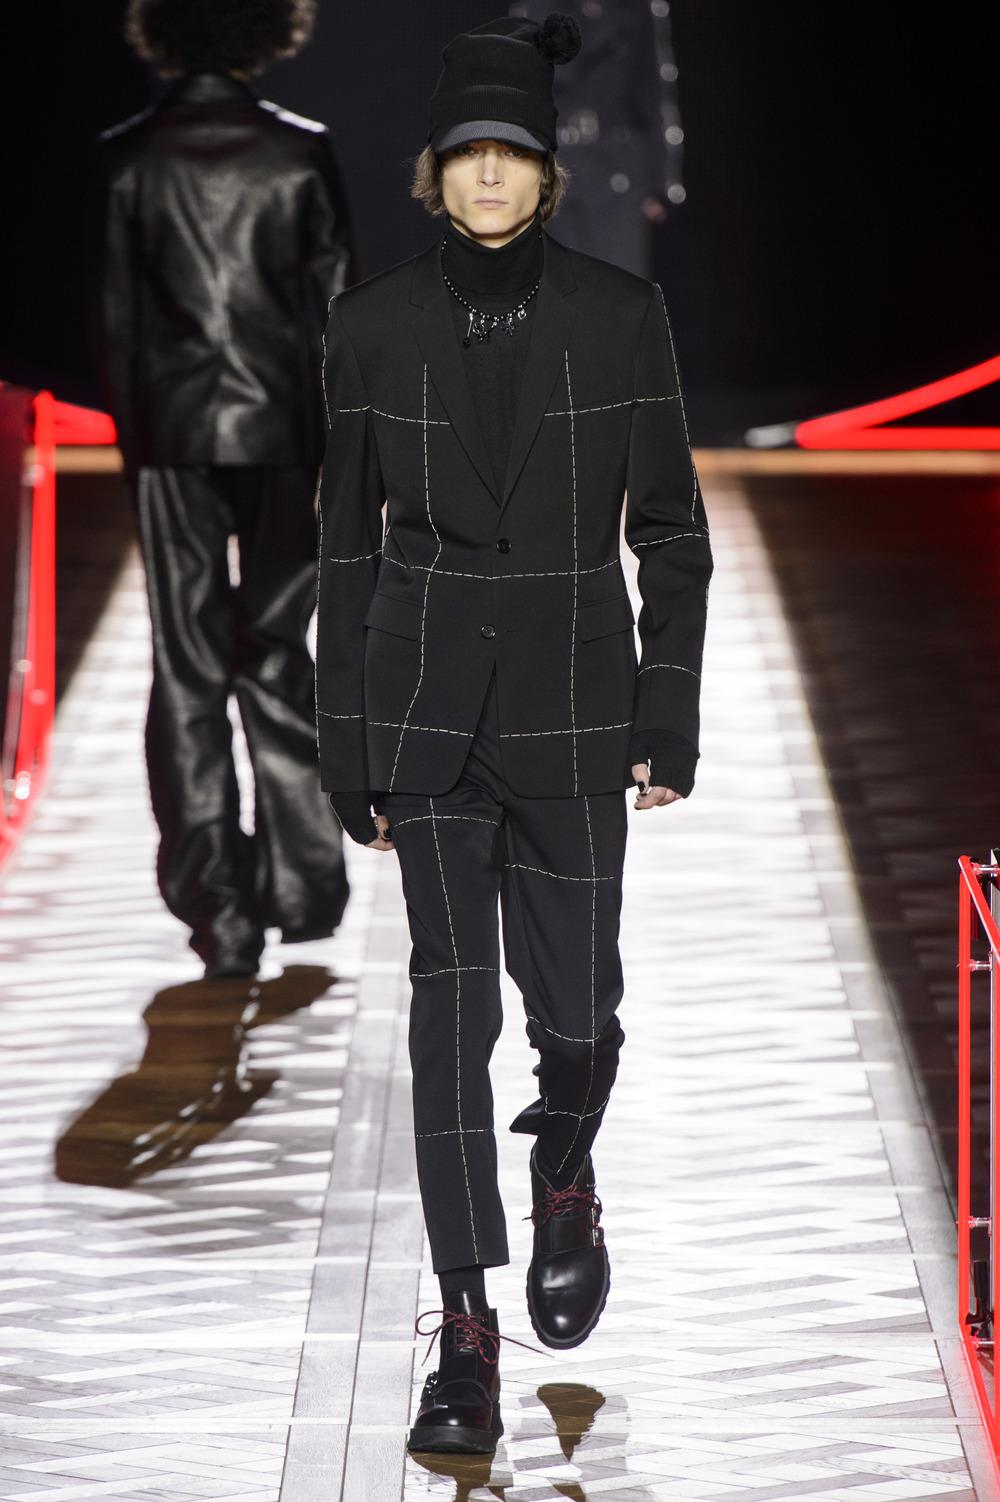 Dior_Homme_Hiver2016-17_look_22.JPG